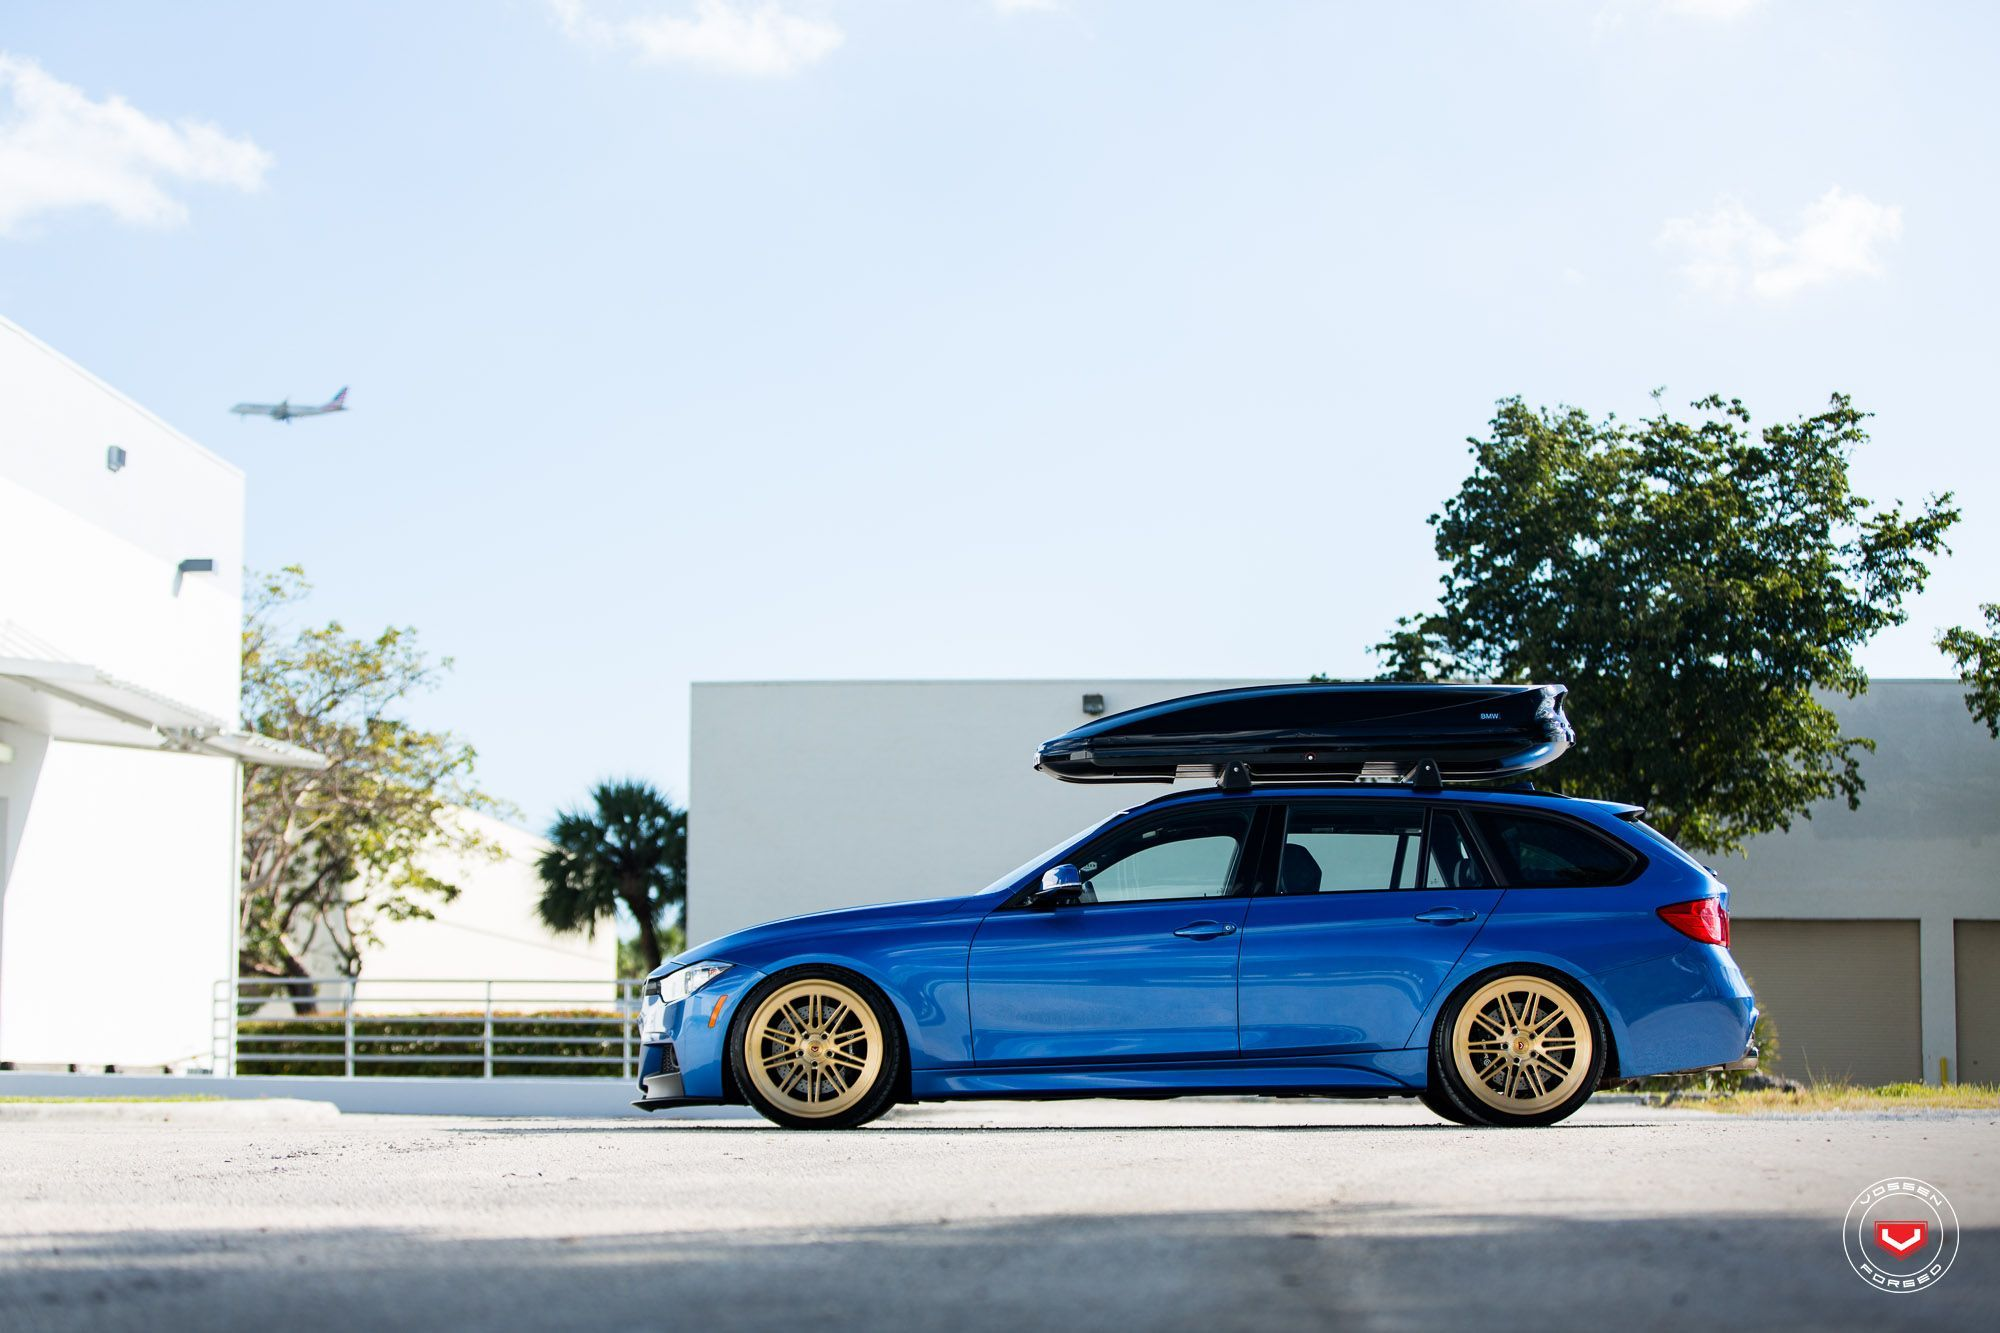 BMW F31 328i Touring xDrive MPackage Estoril Blue Vossen